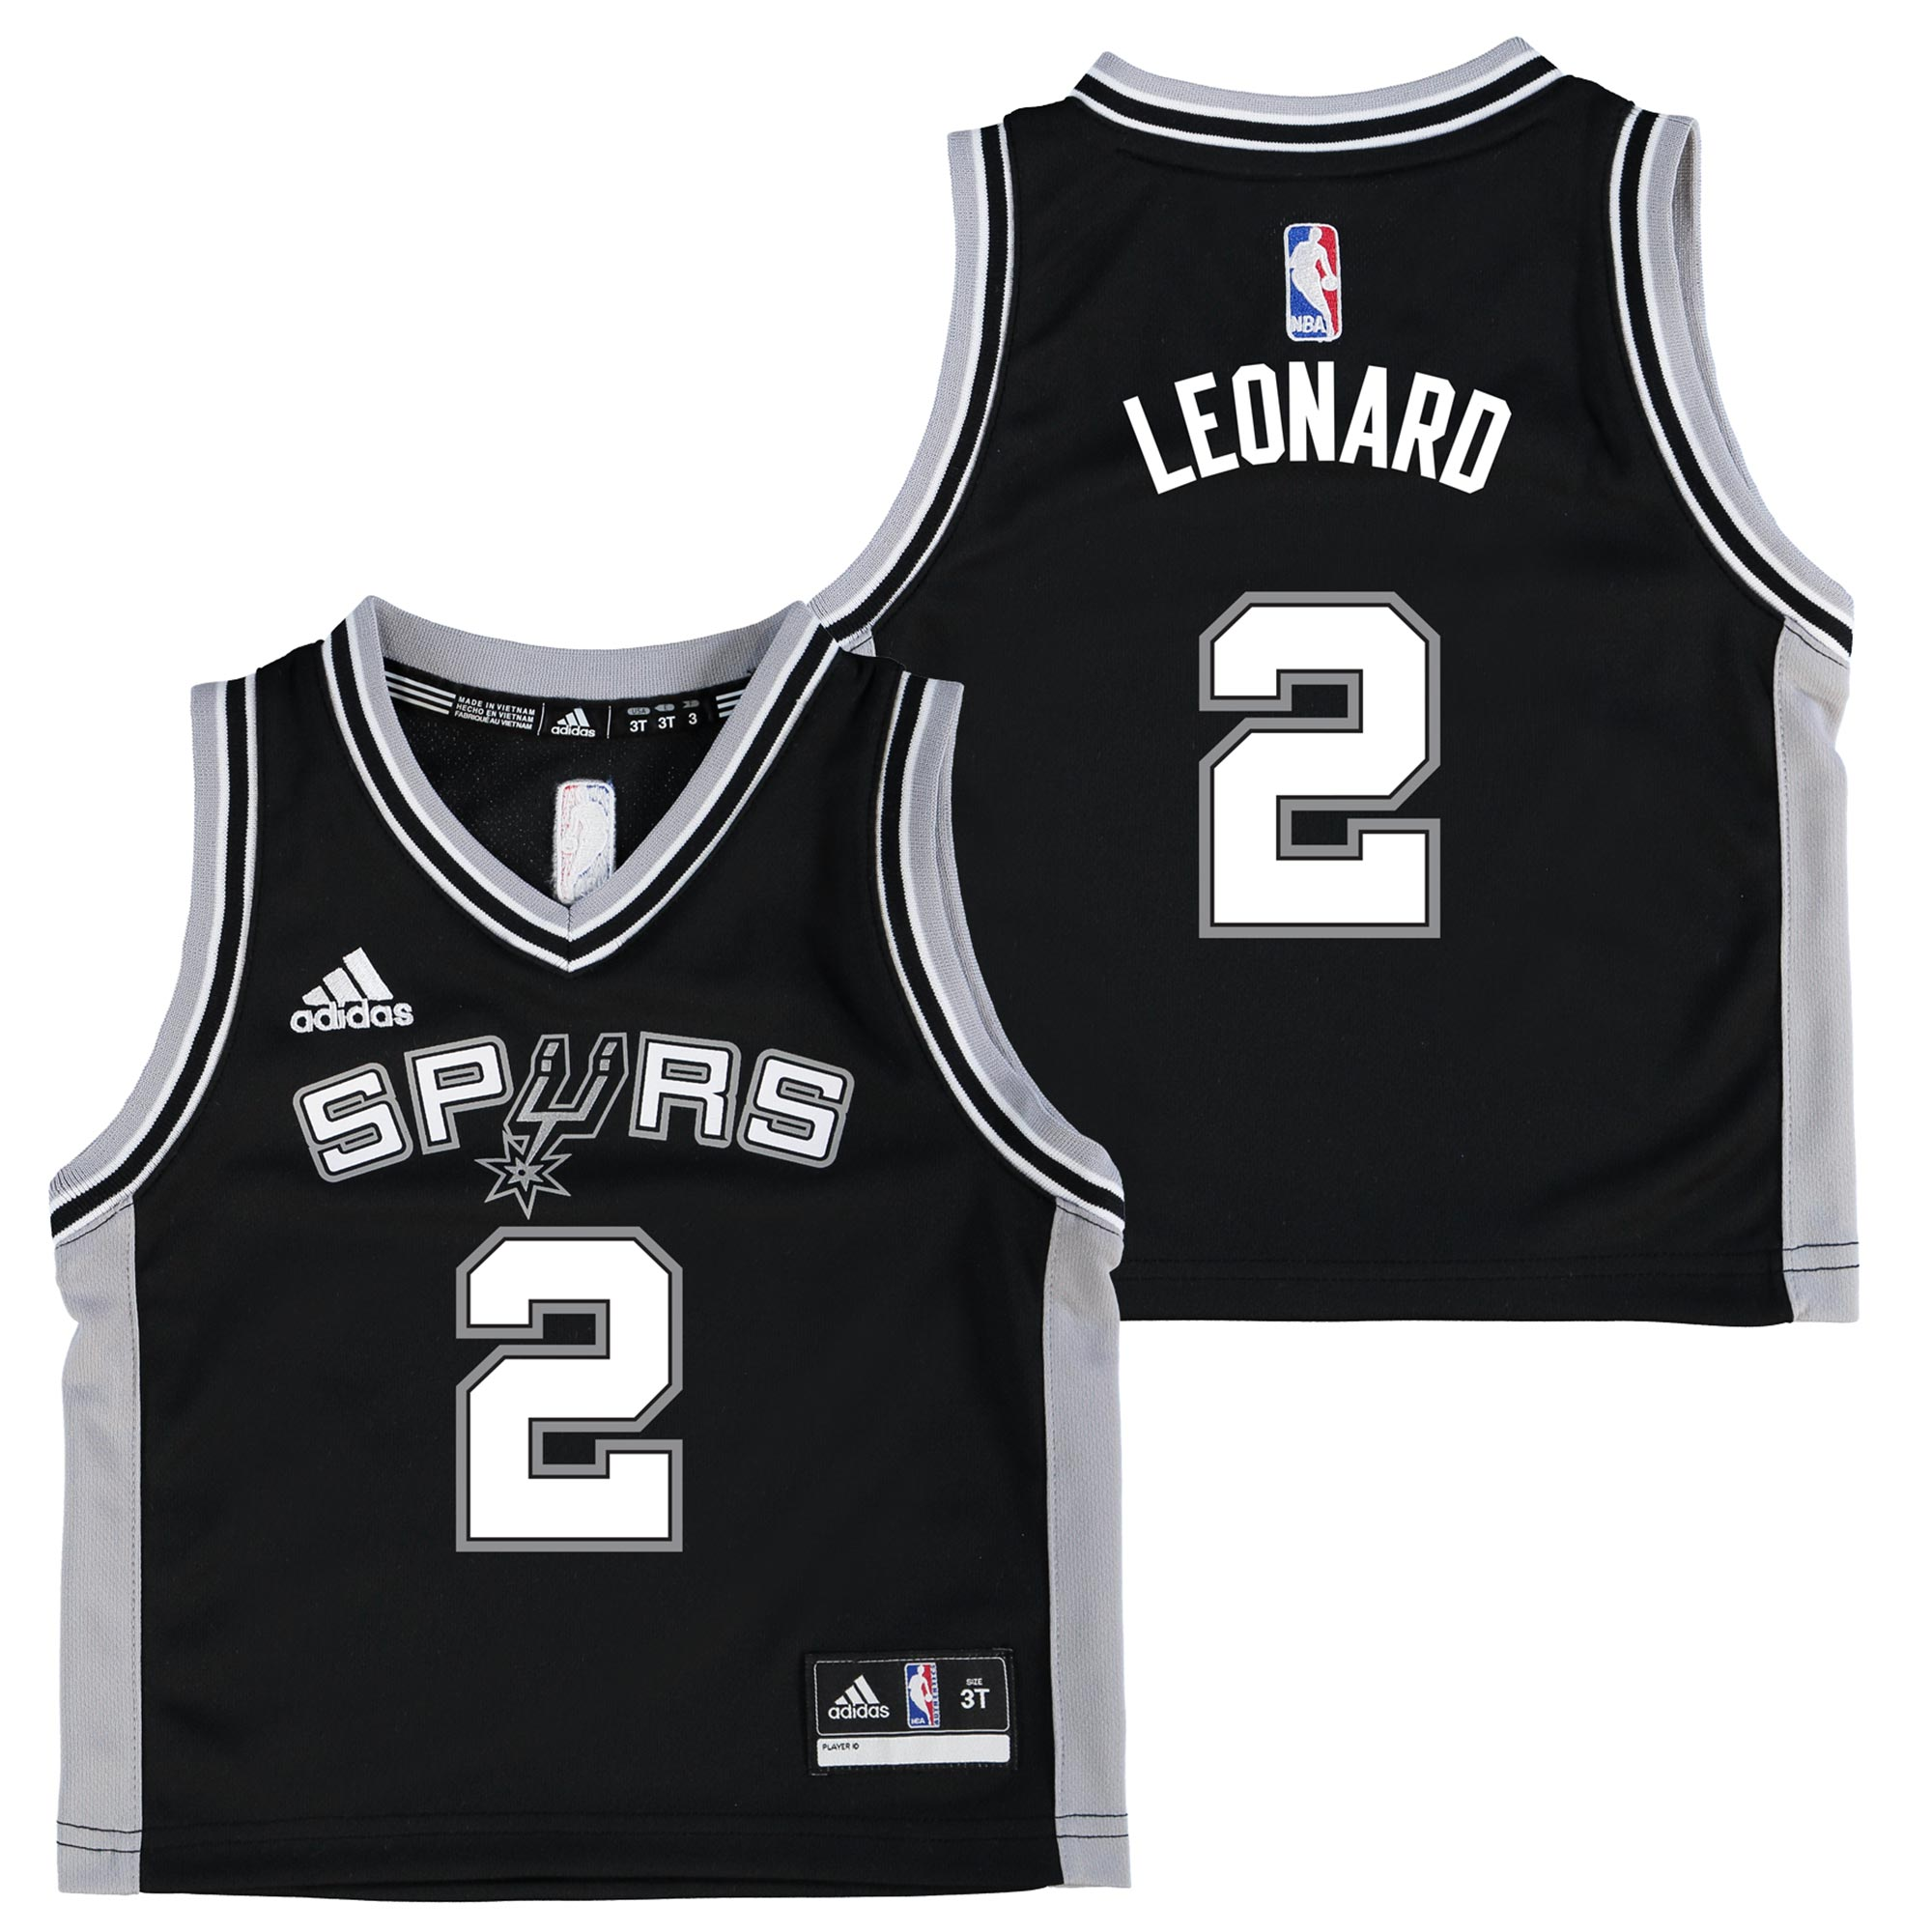 San Antonio Spurs Road Replica Jersey - Kawhi Leonard - Toddler